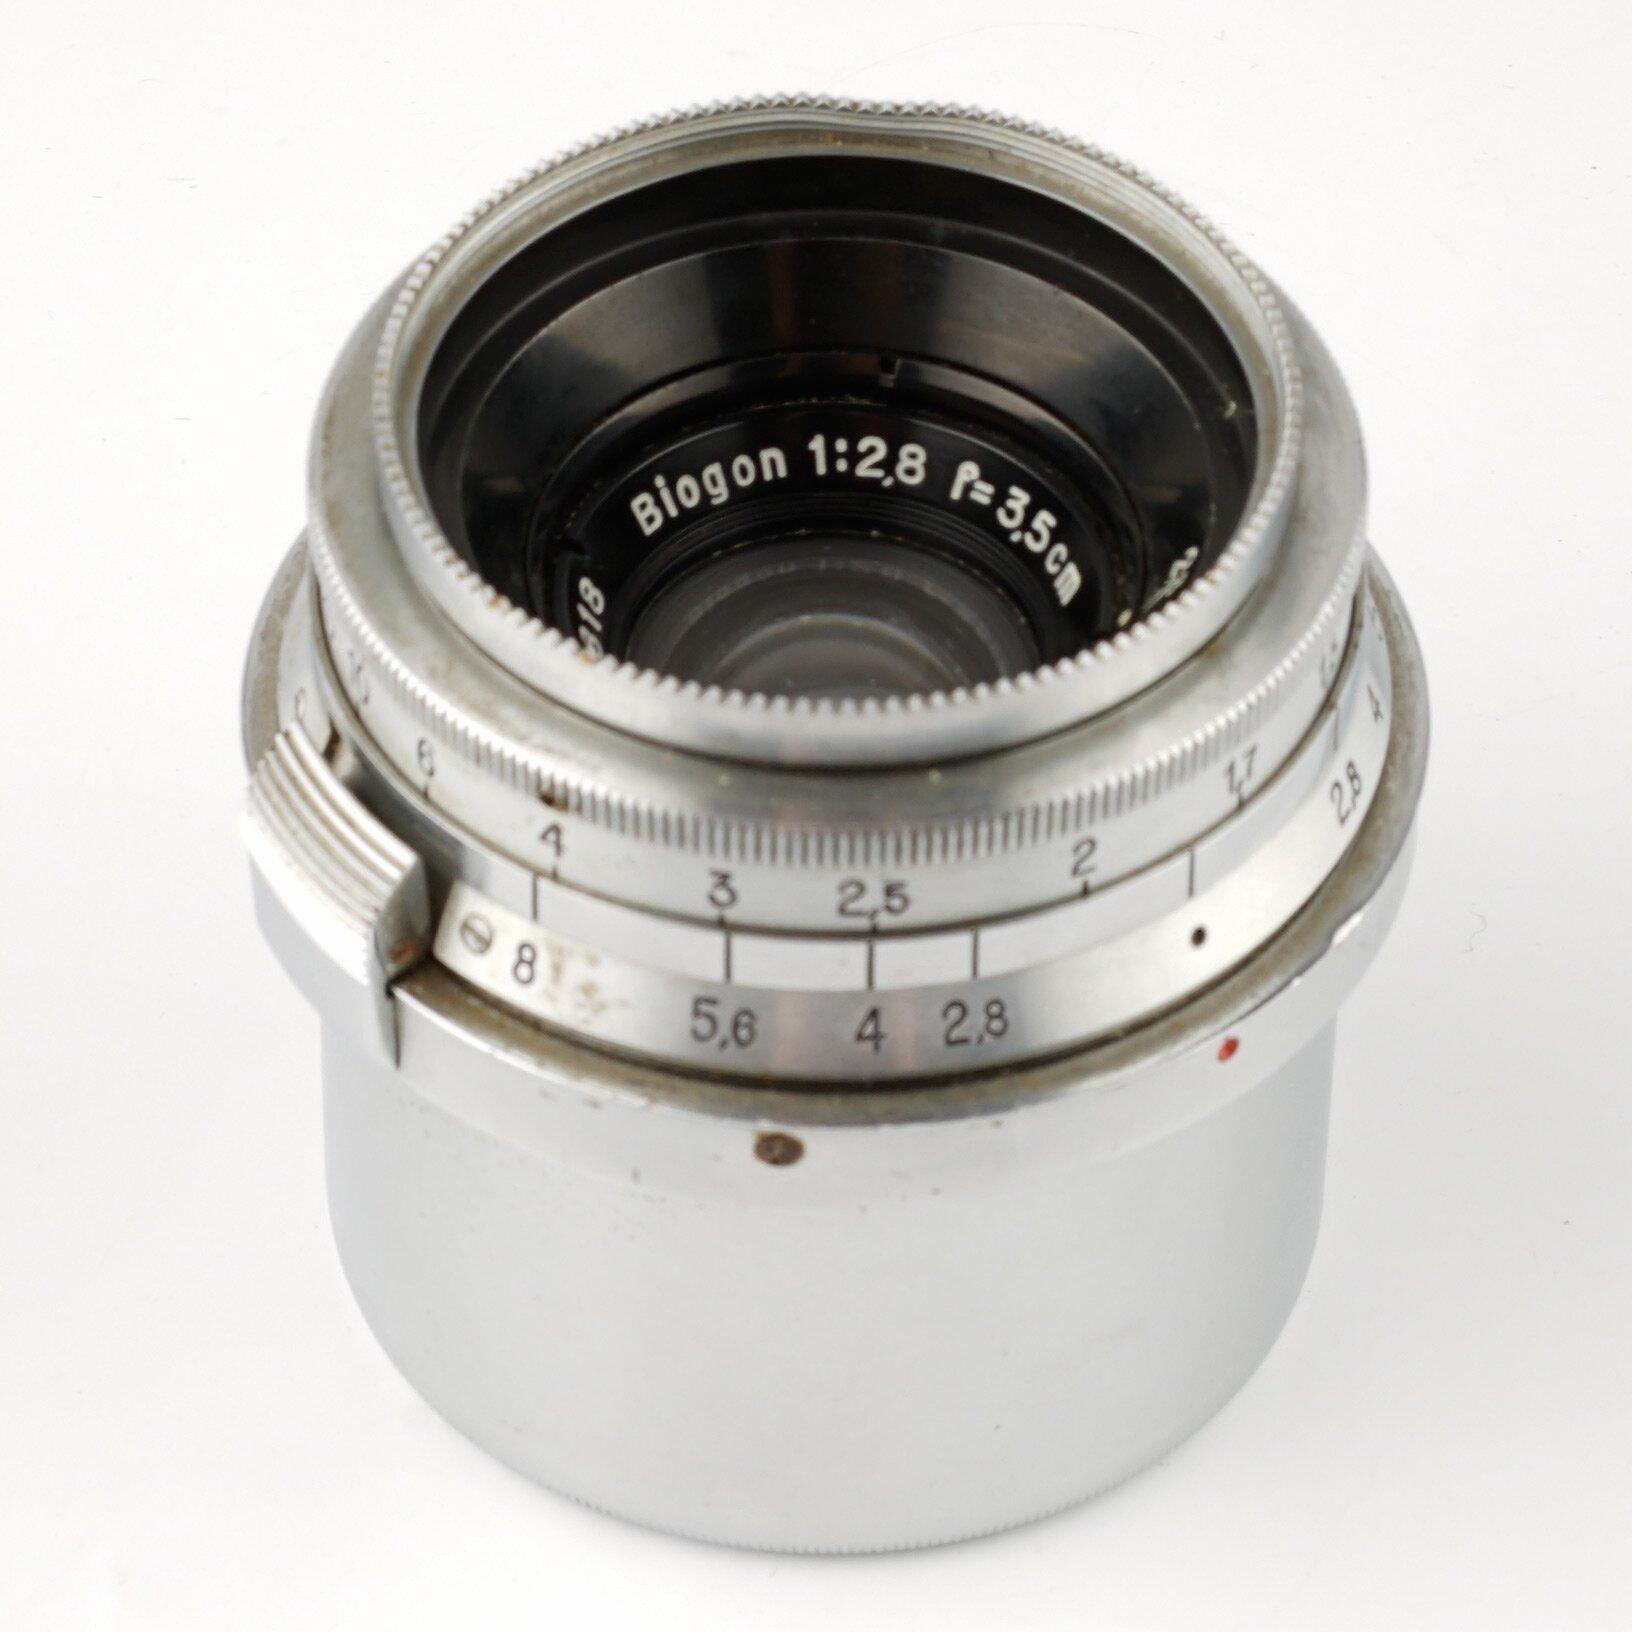 Carl Zeiss Biogon 2,8/3,5cm Contax RF